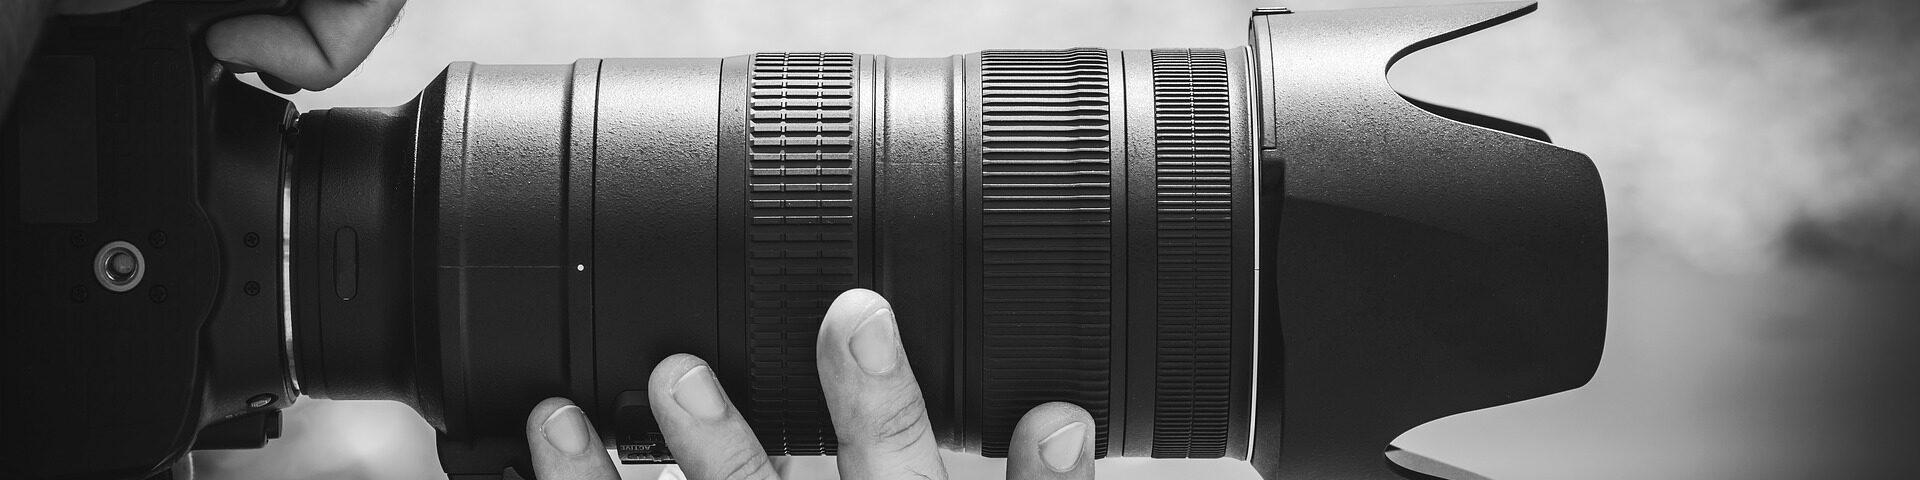 Highest Megapixel Camera in the World - Ibandhu